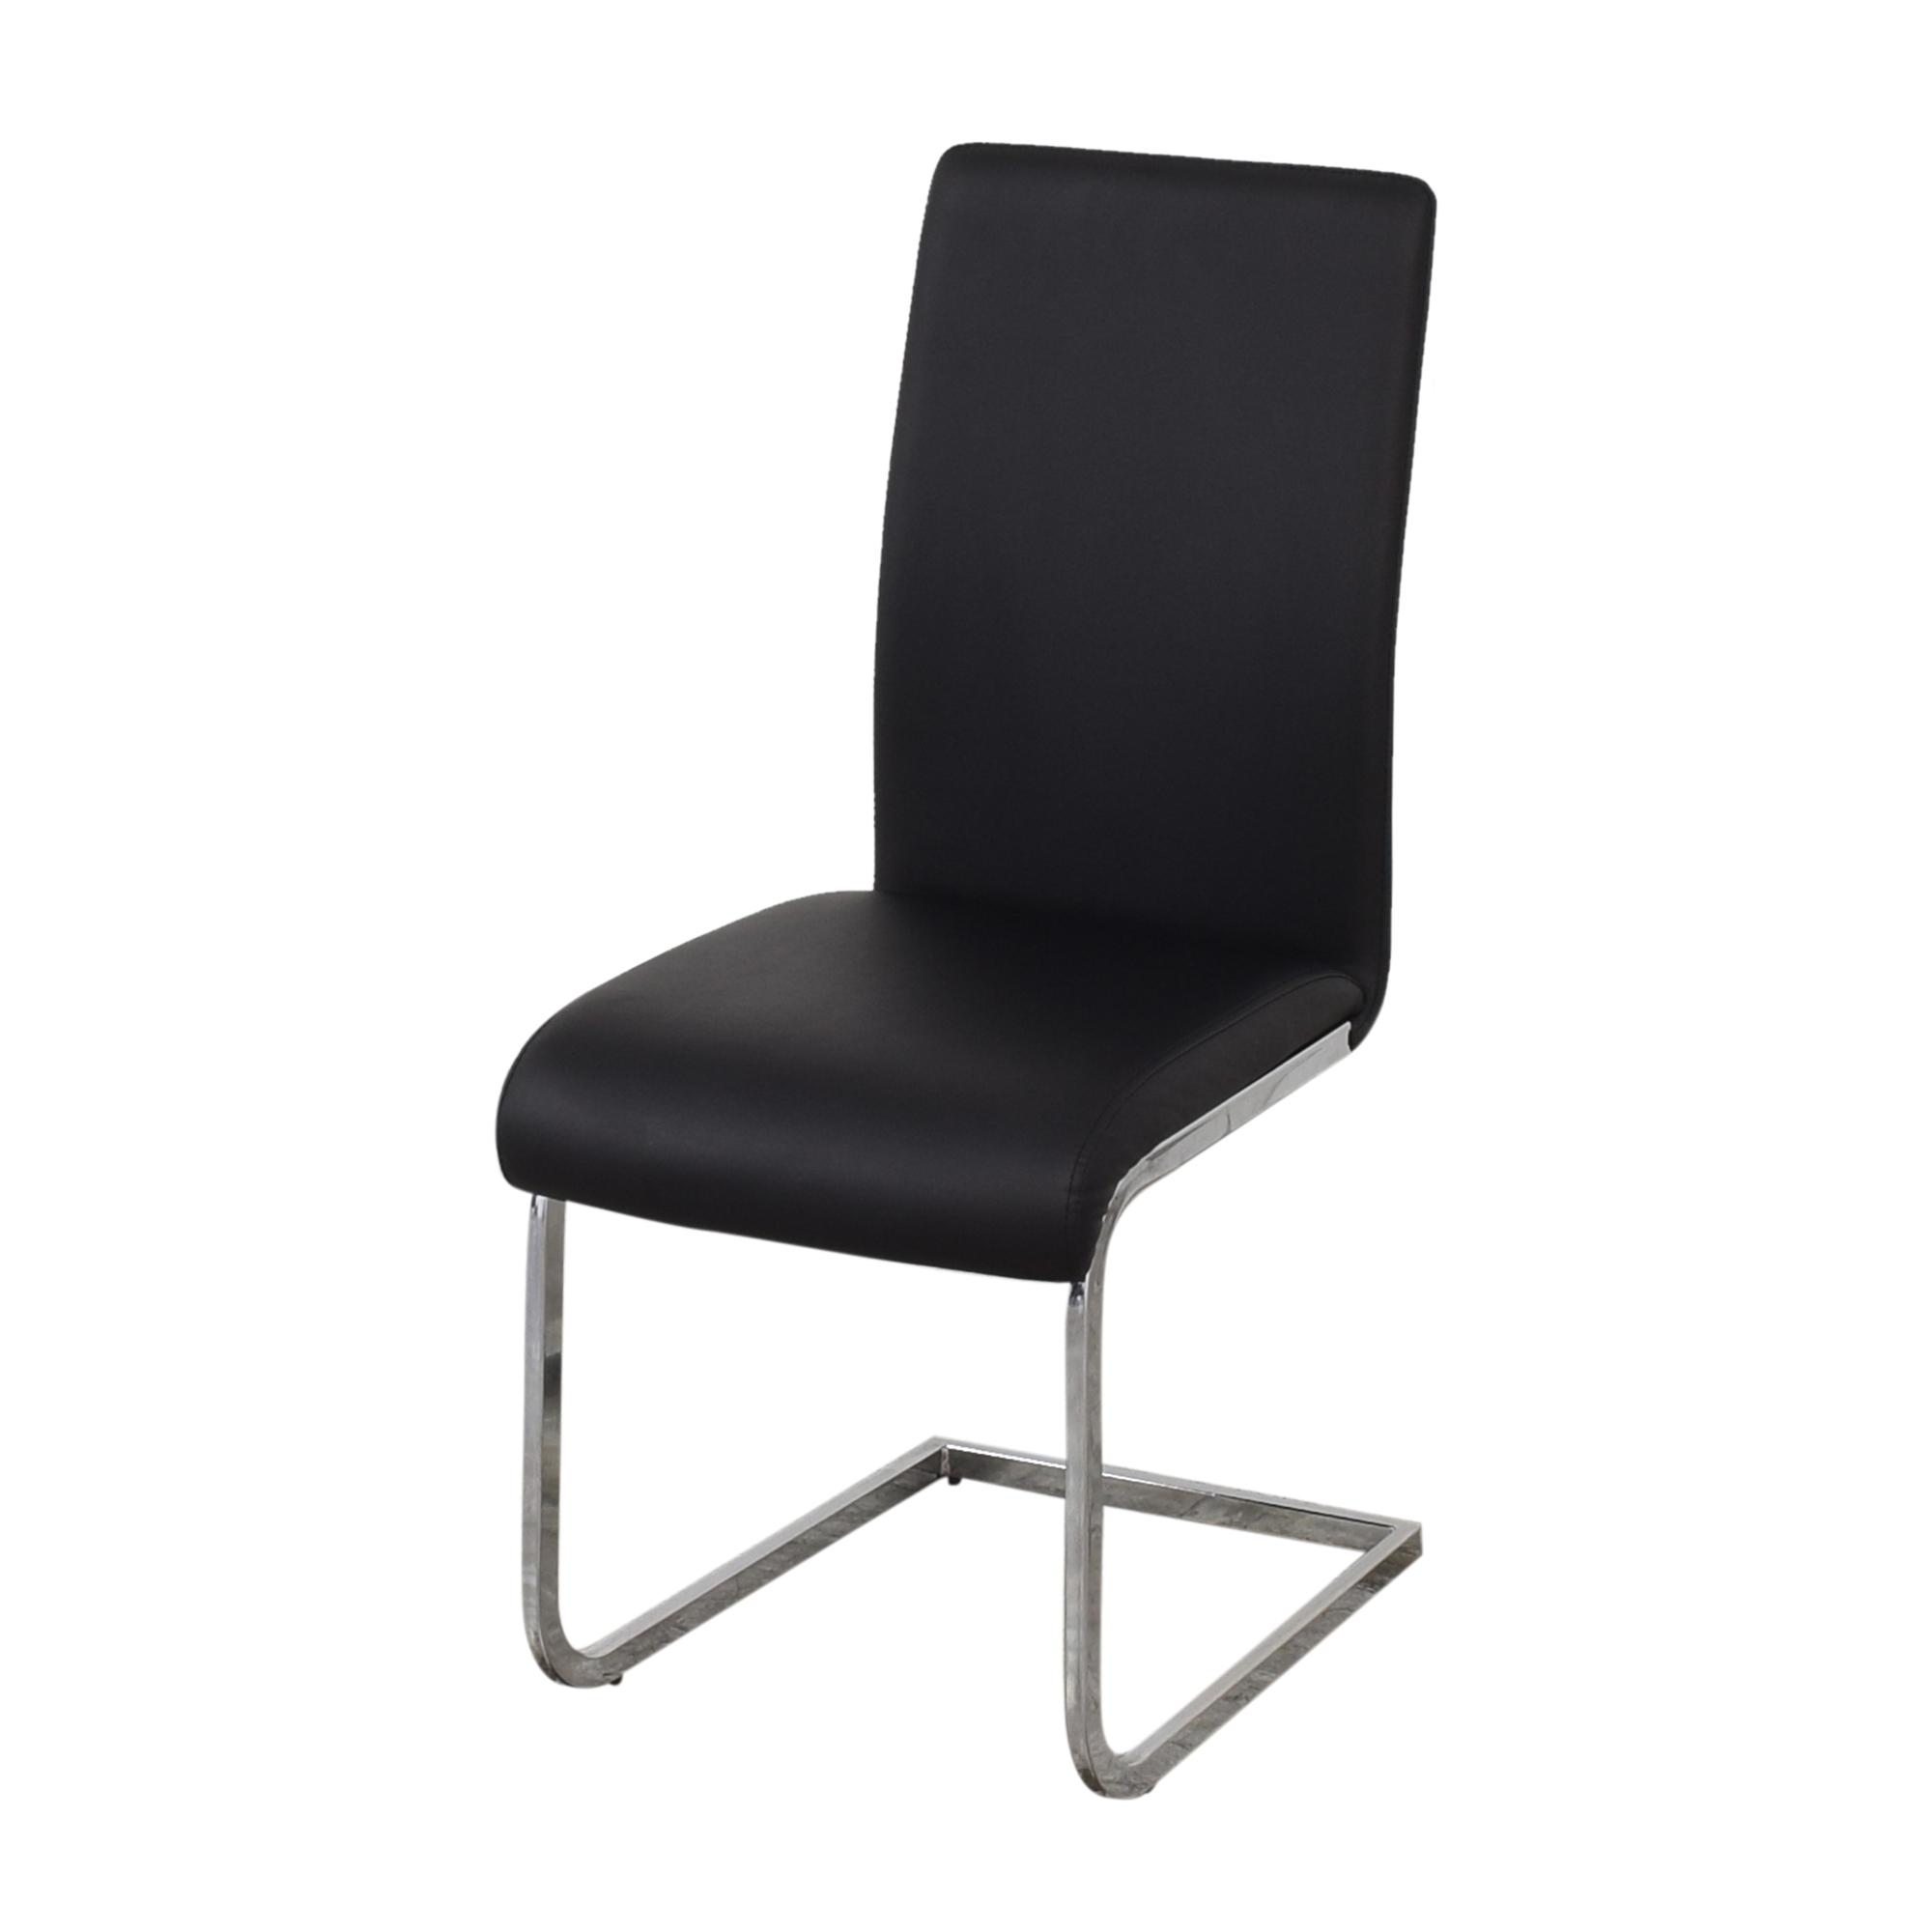 CB2 CB2 Silverado Chairs pa